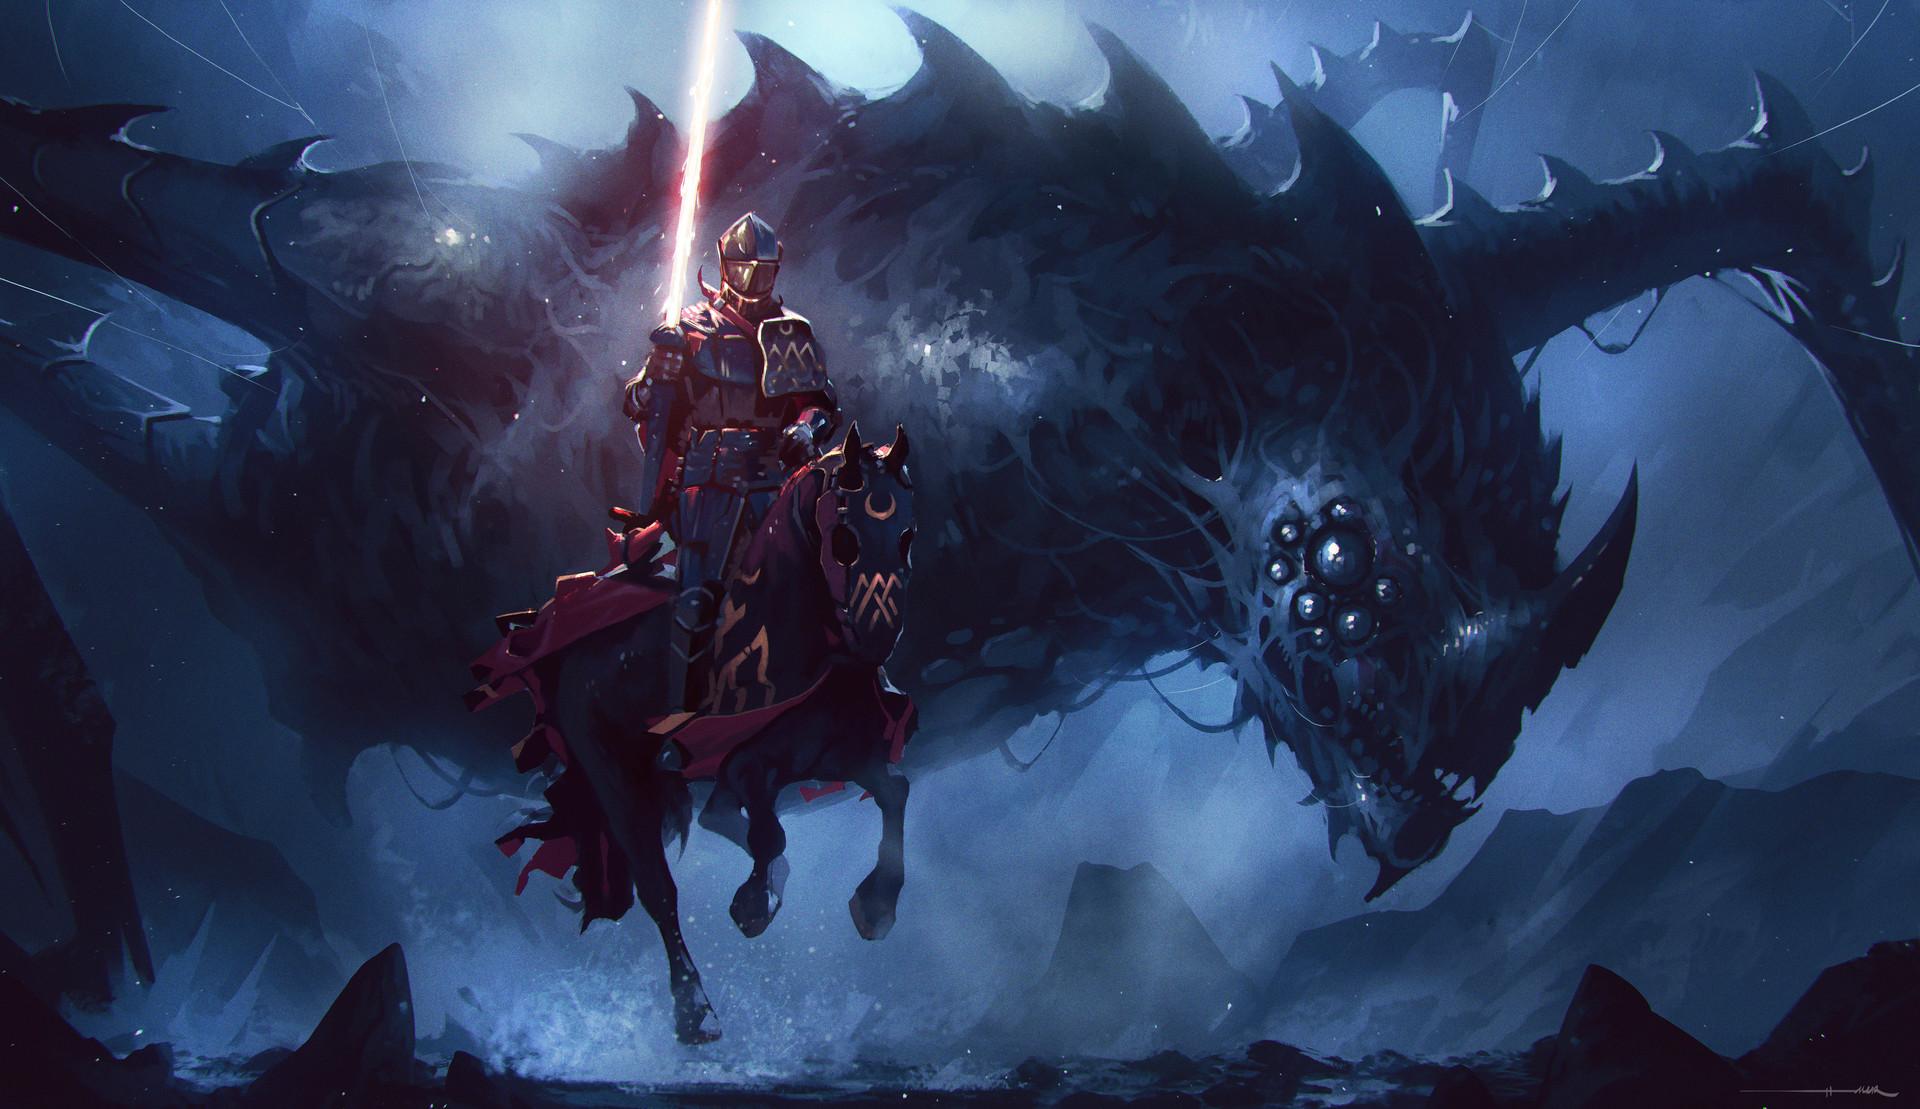 Knight: Темні, Armor, Creature, Воїни, Knight, Lance